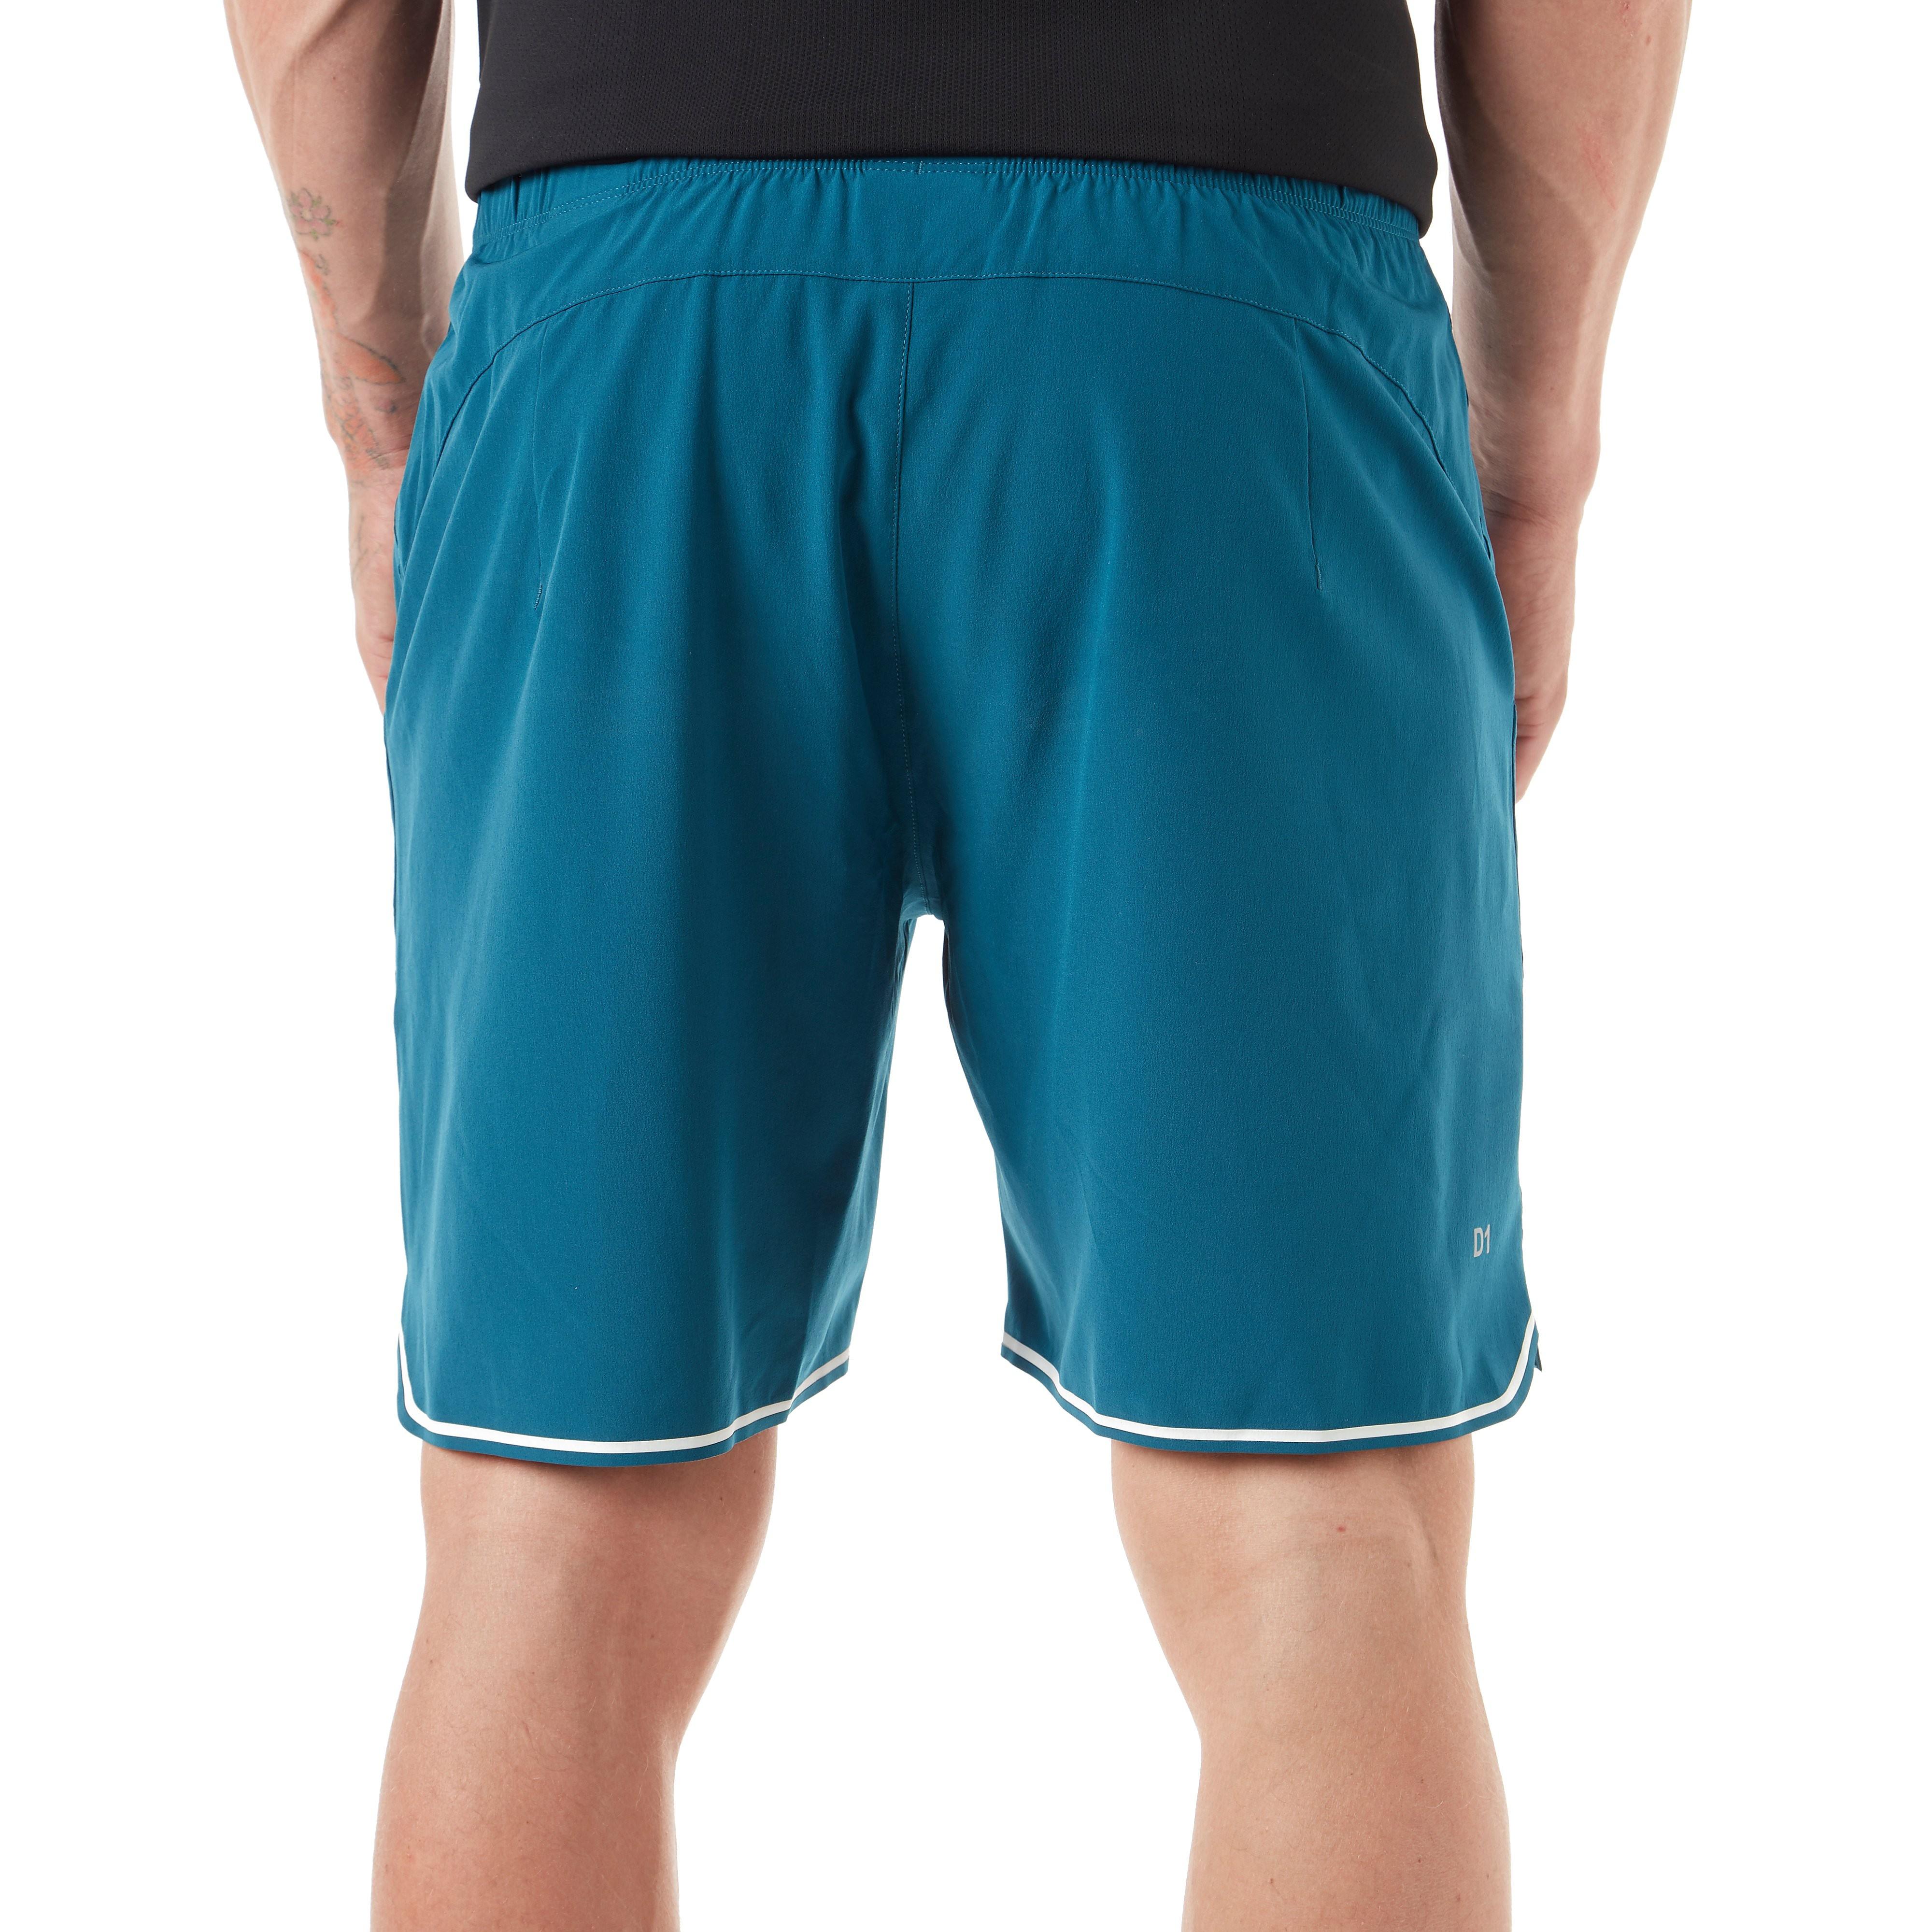 ASICS Performance Men's Tennis Shorts